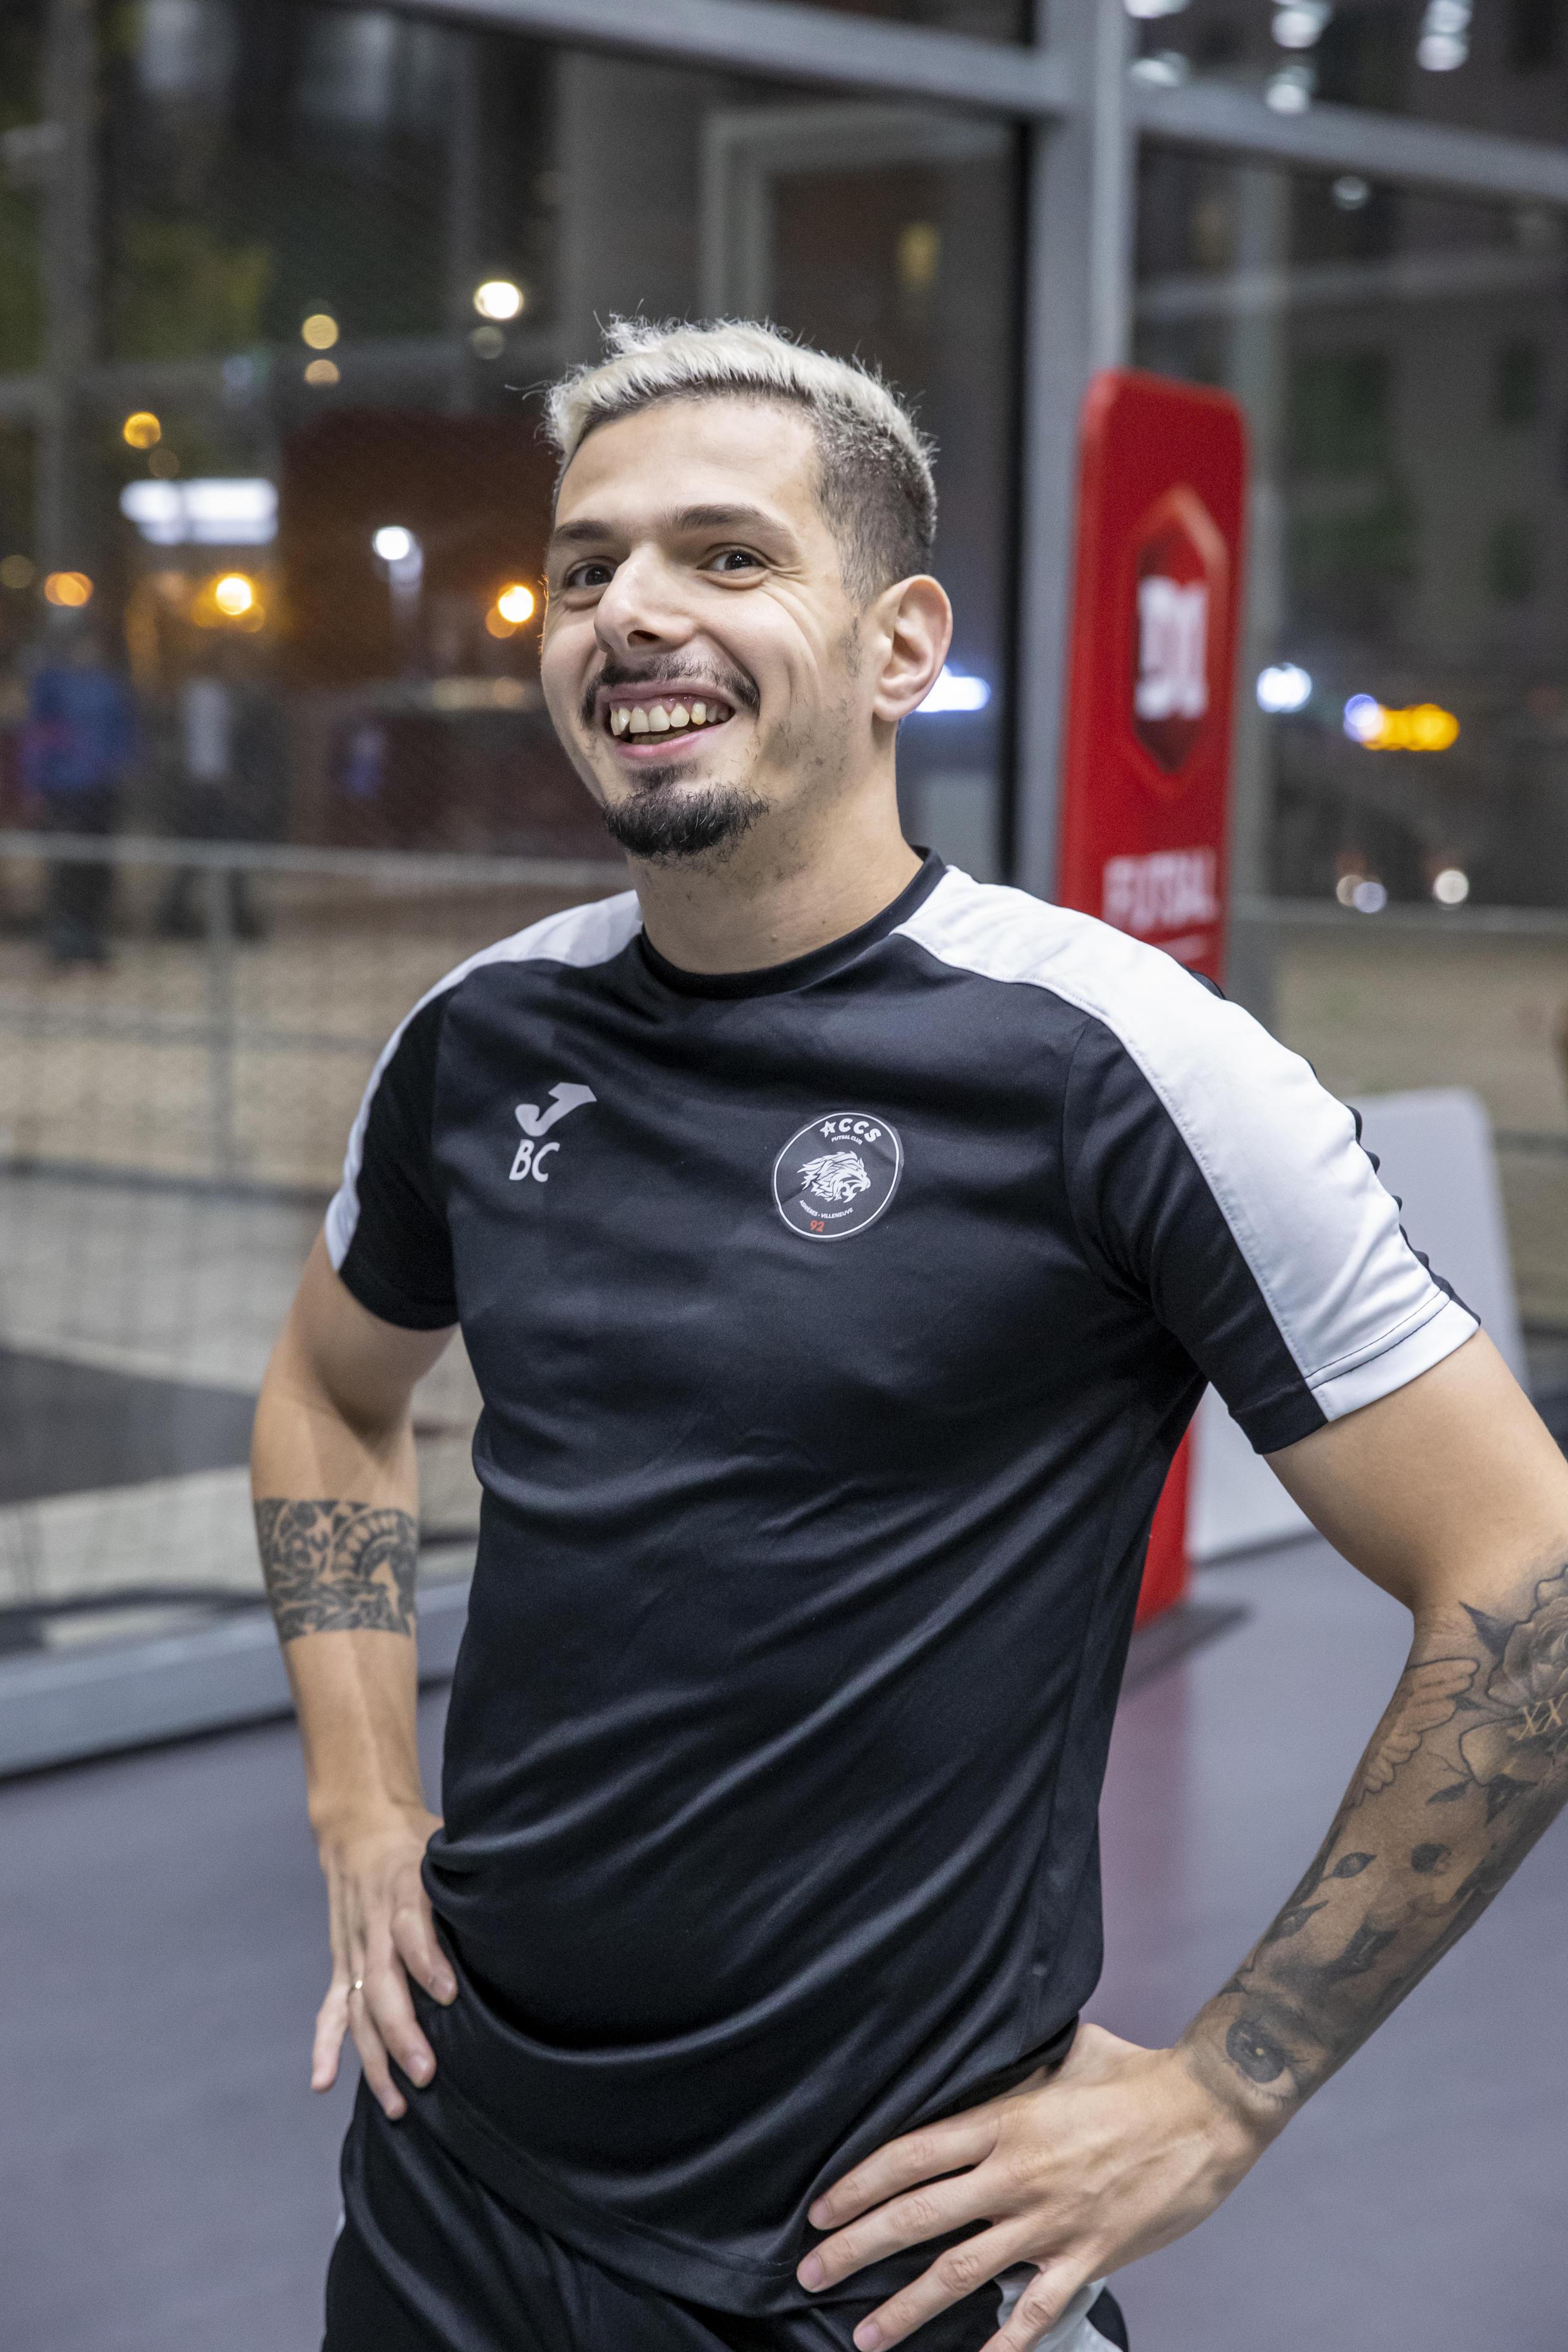 Bruno Coelho - Accs - Futsal - Desporto - Sport - Portugal